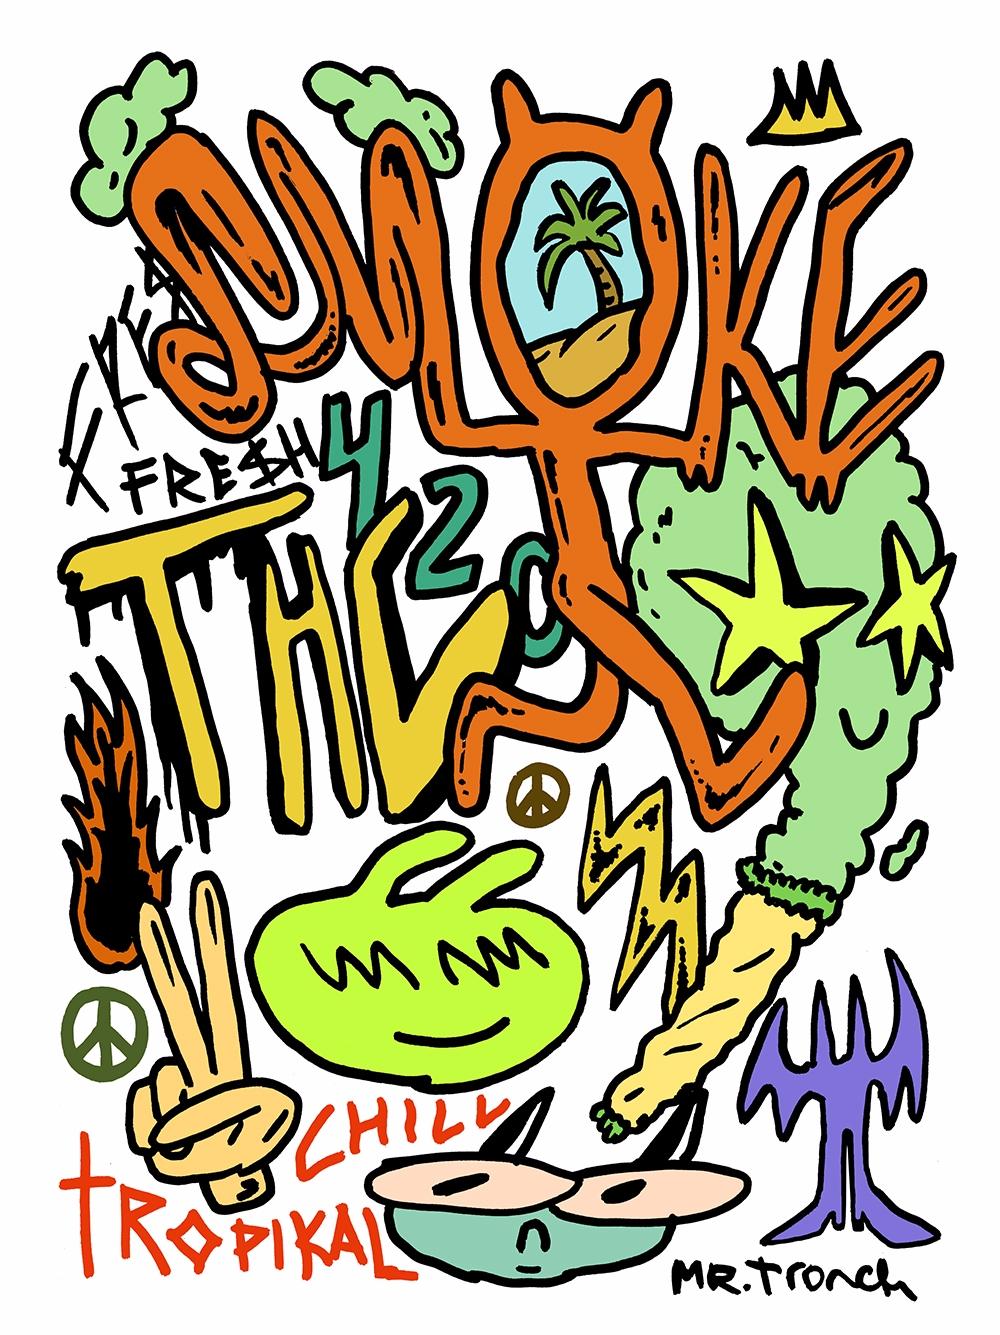 Tropikal Chill bru - smoke, weed - mrtronch   ello